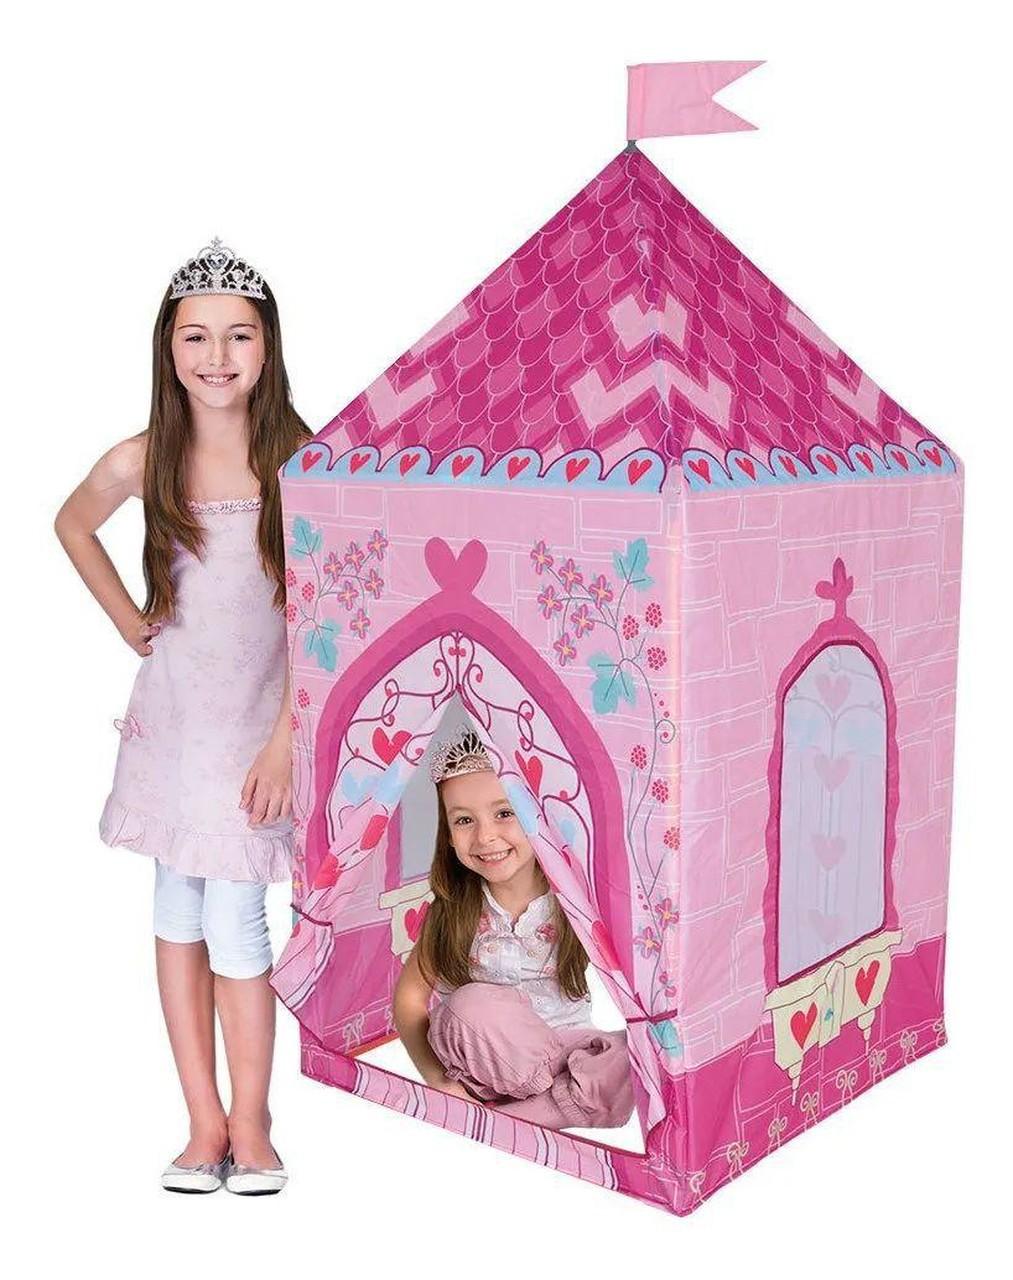 Barraca Infantil Tenda Princesa Love - DM Toys 5884